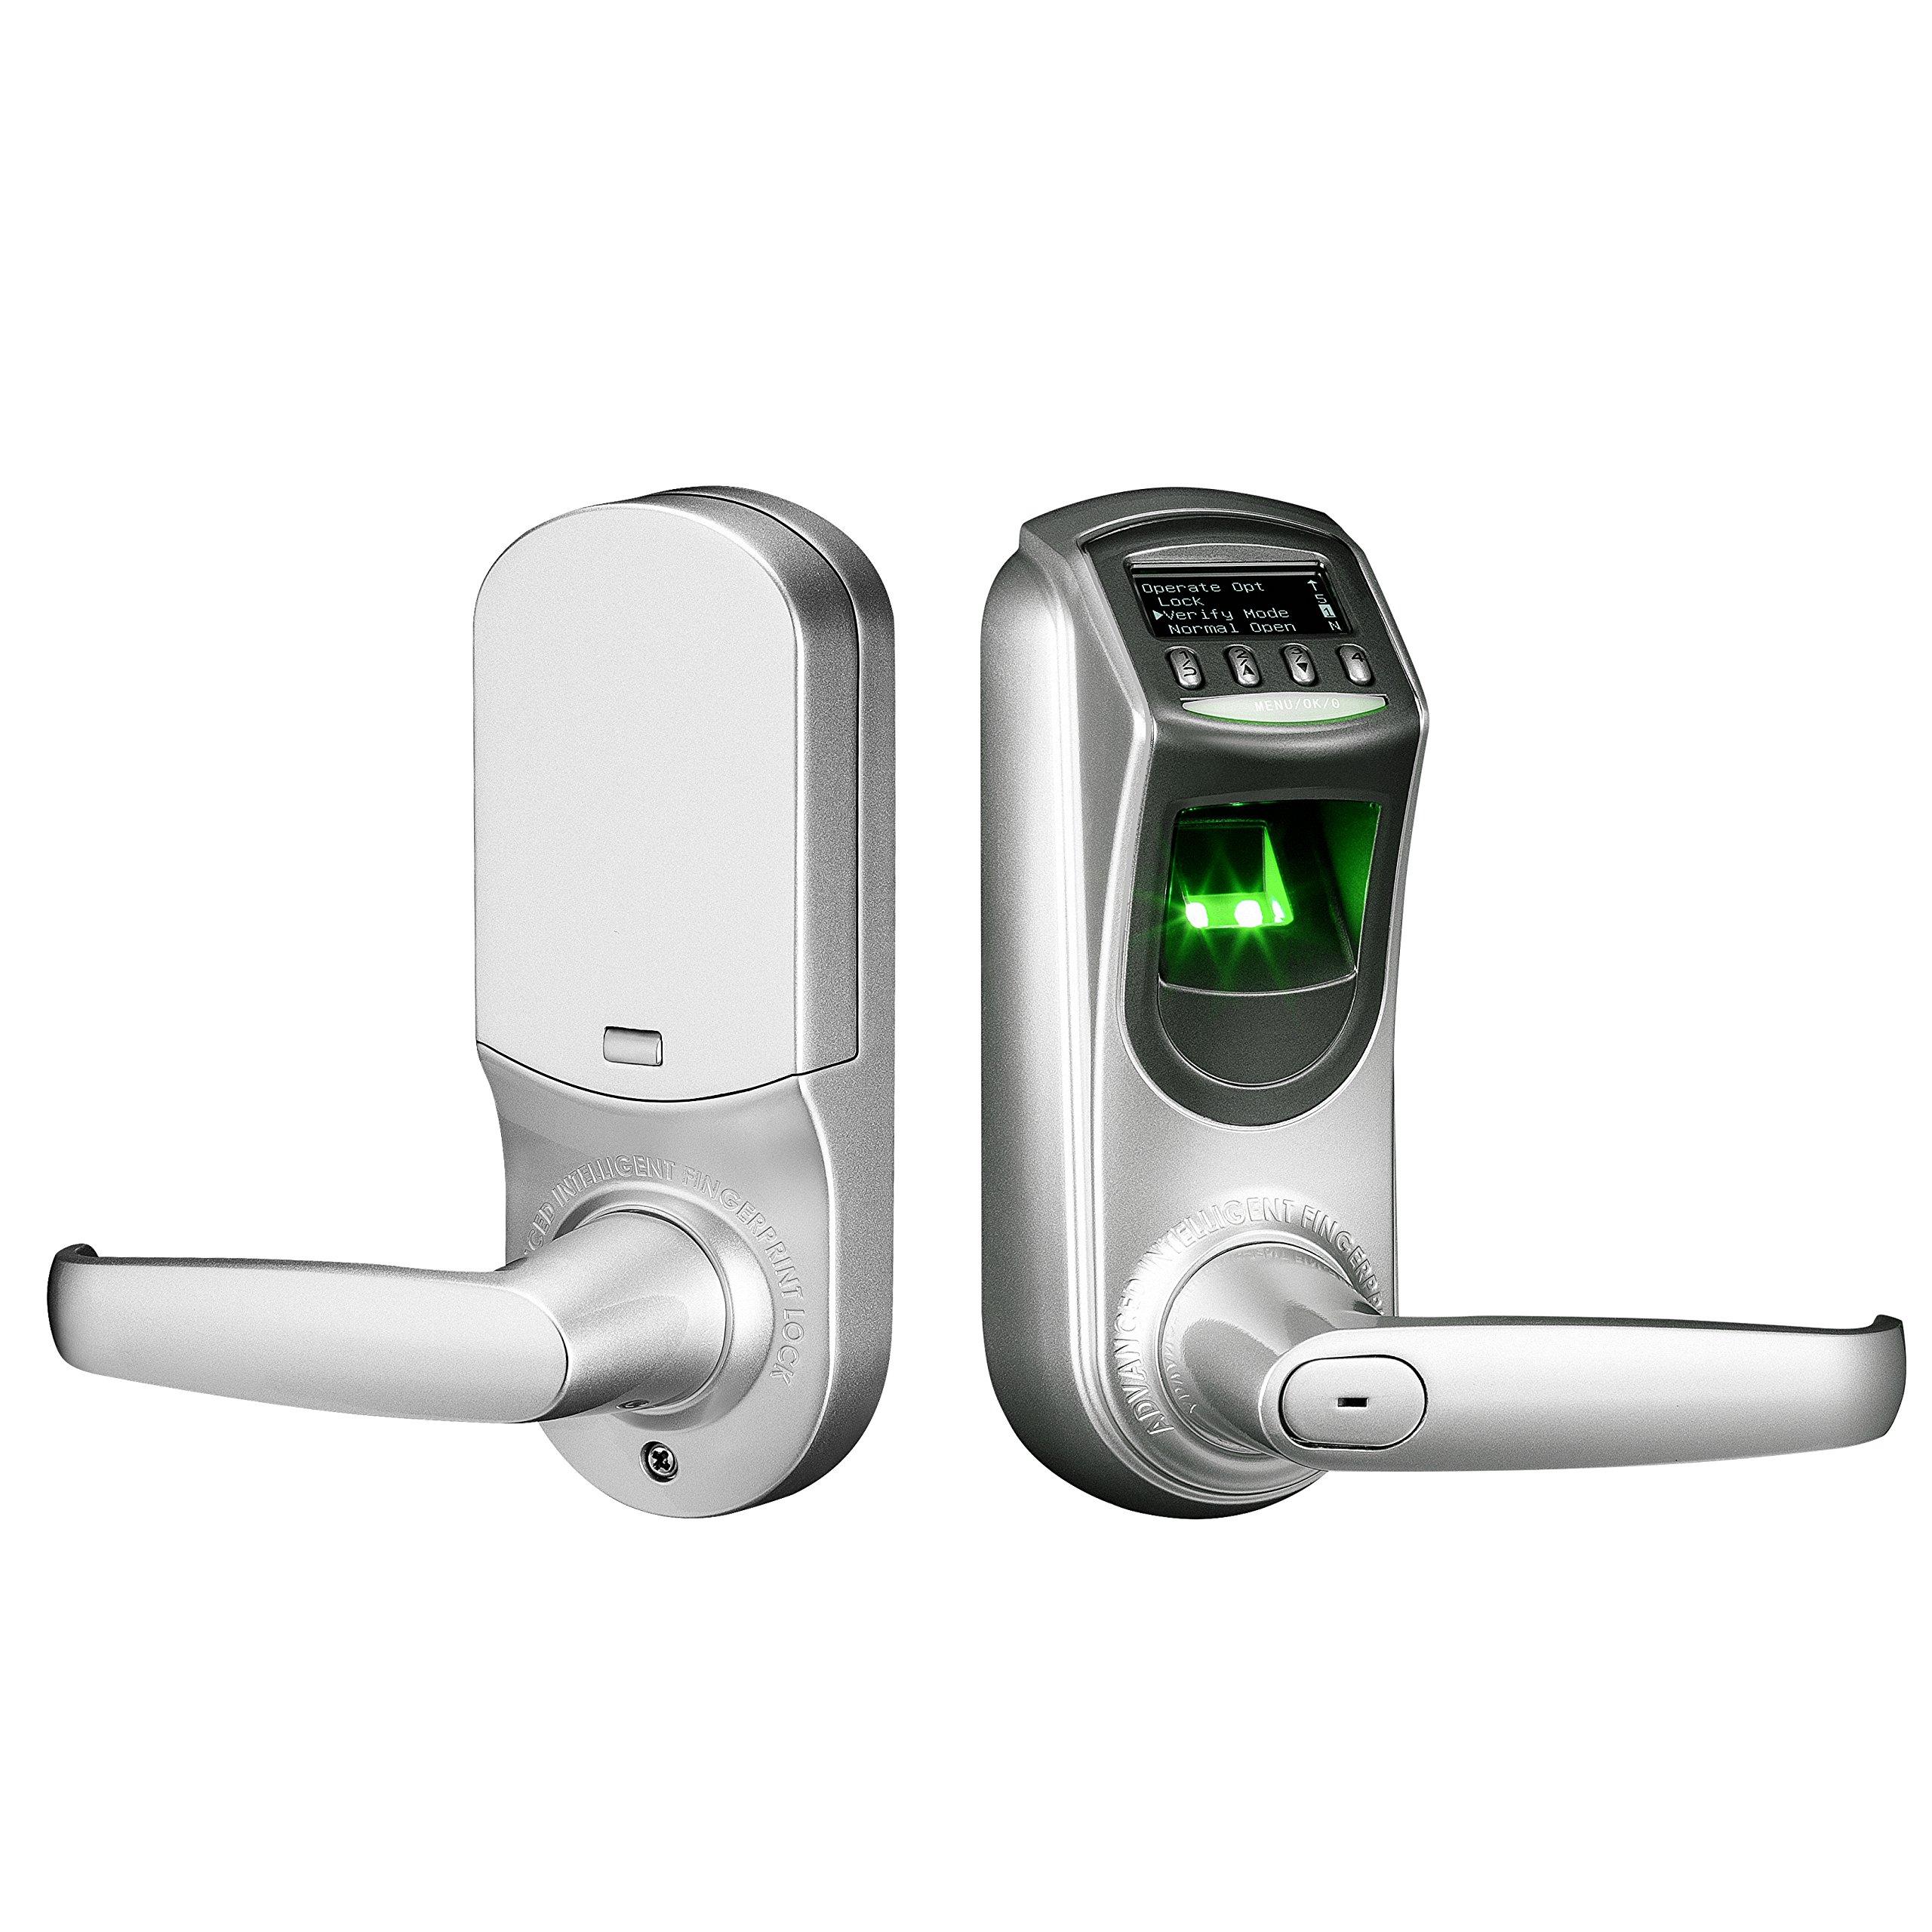 ZKTeco Fingerprint Biometric Keyless Smart Door Lock with Visual Menu Display Support Unlocking Records Tracking&User Data Backup